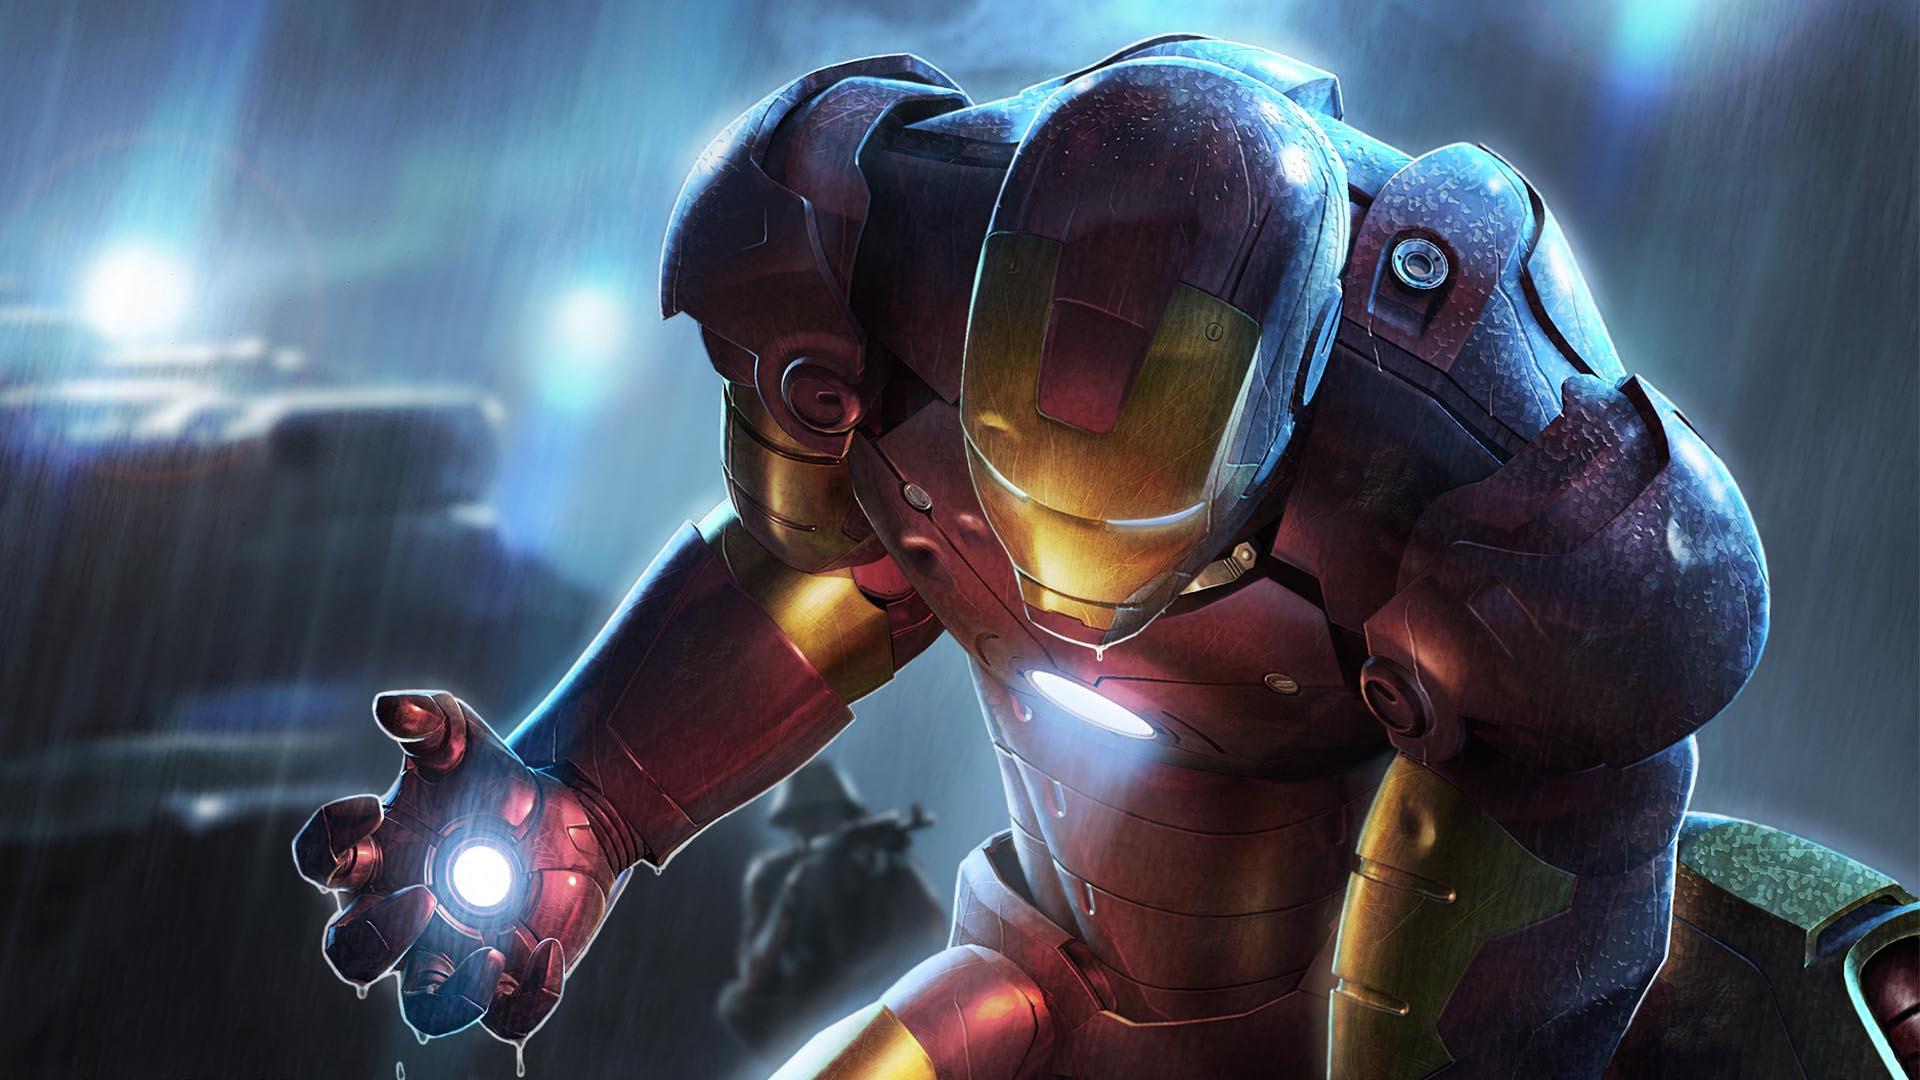 Iron-Man-Charging-http-www-fullhdwpp-com-comics-iron-man-charging-wallpaper-wp3407486